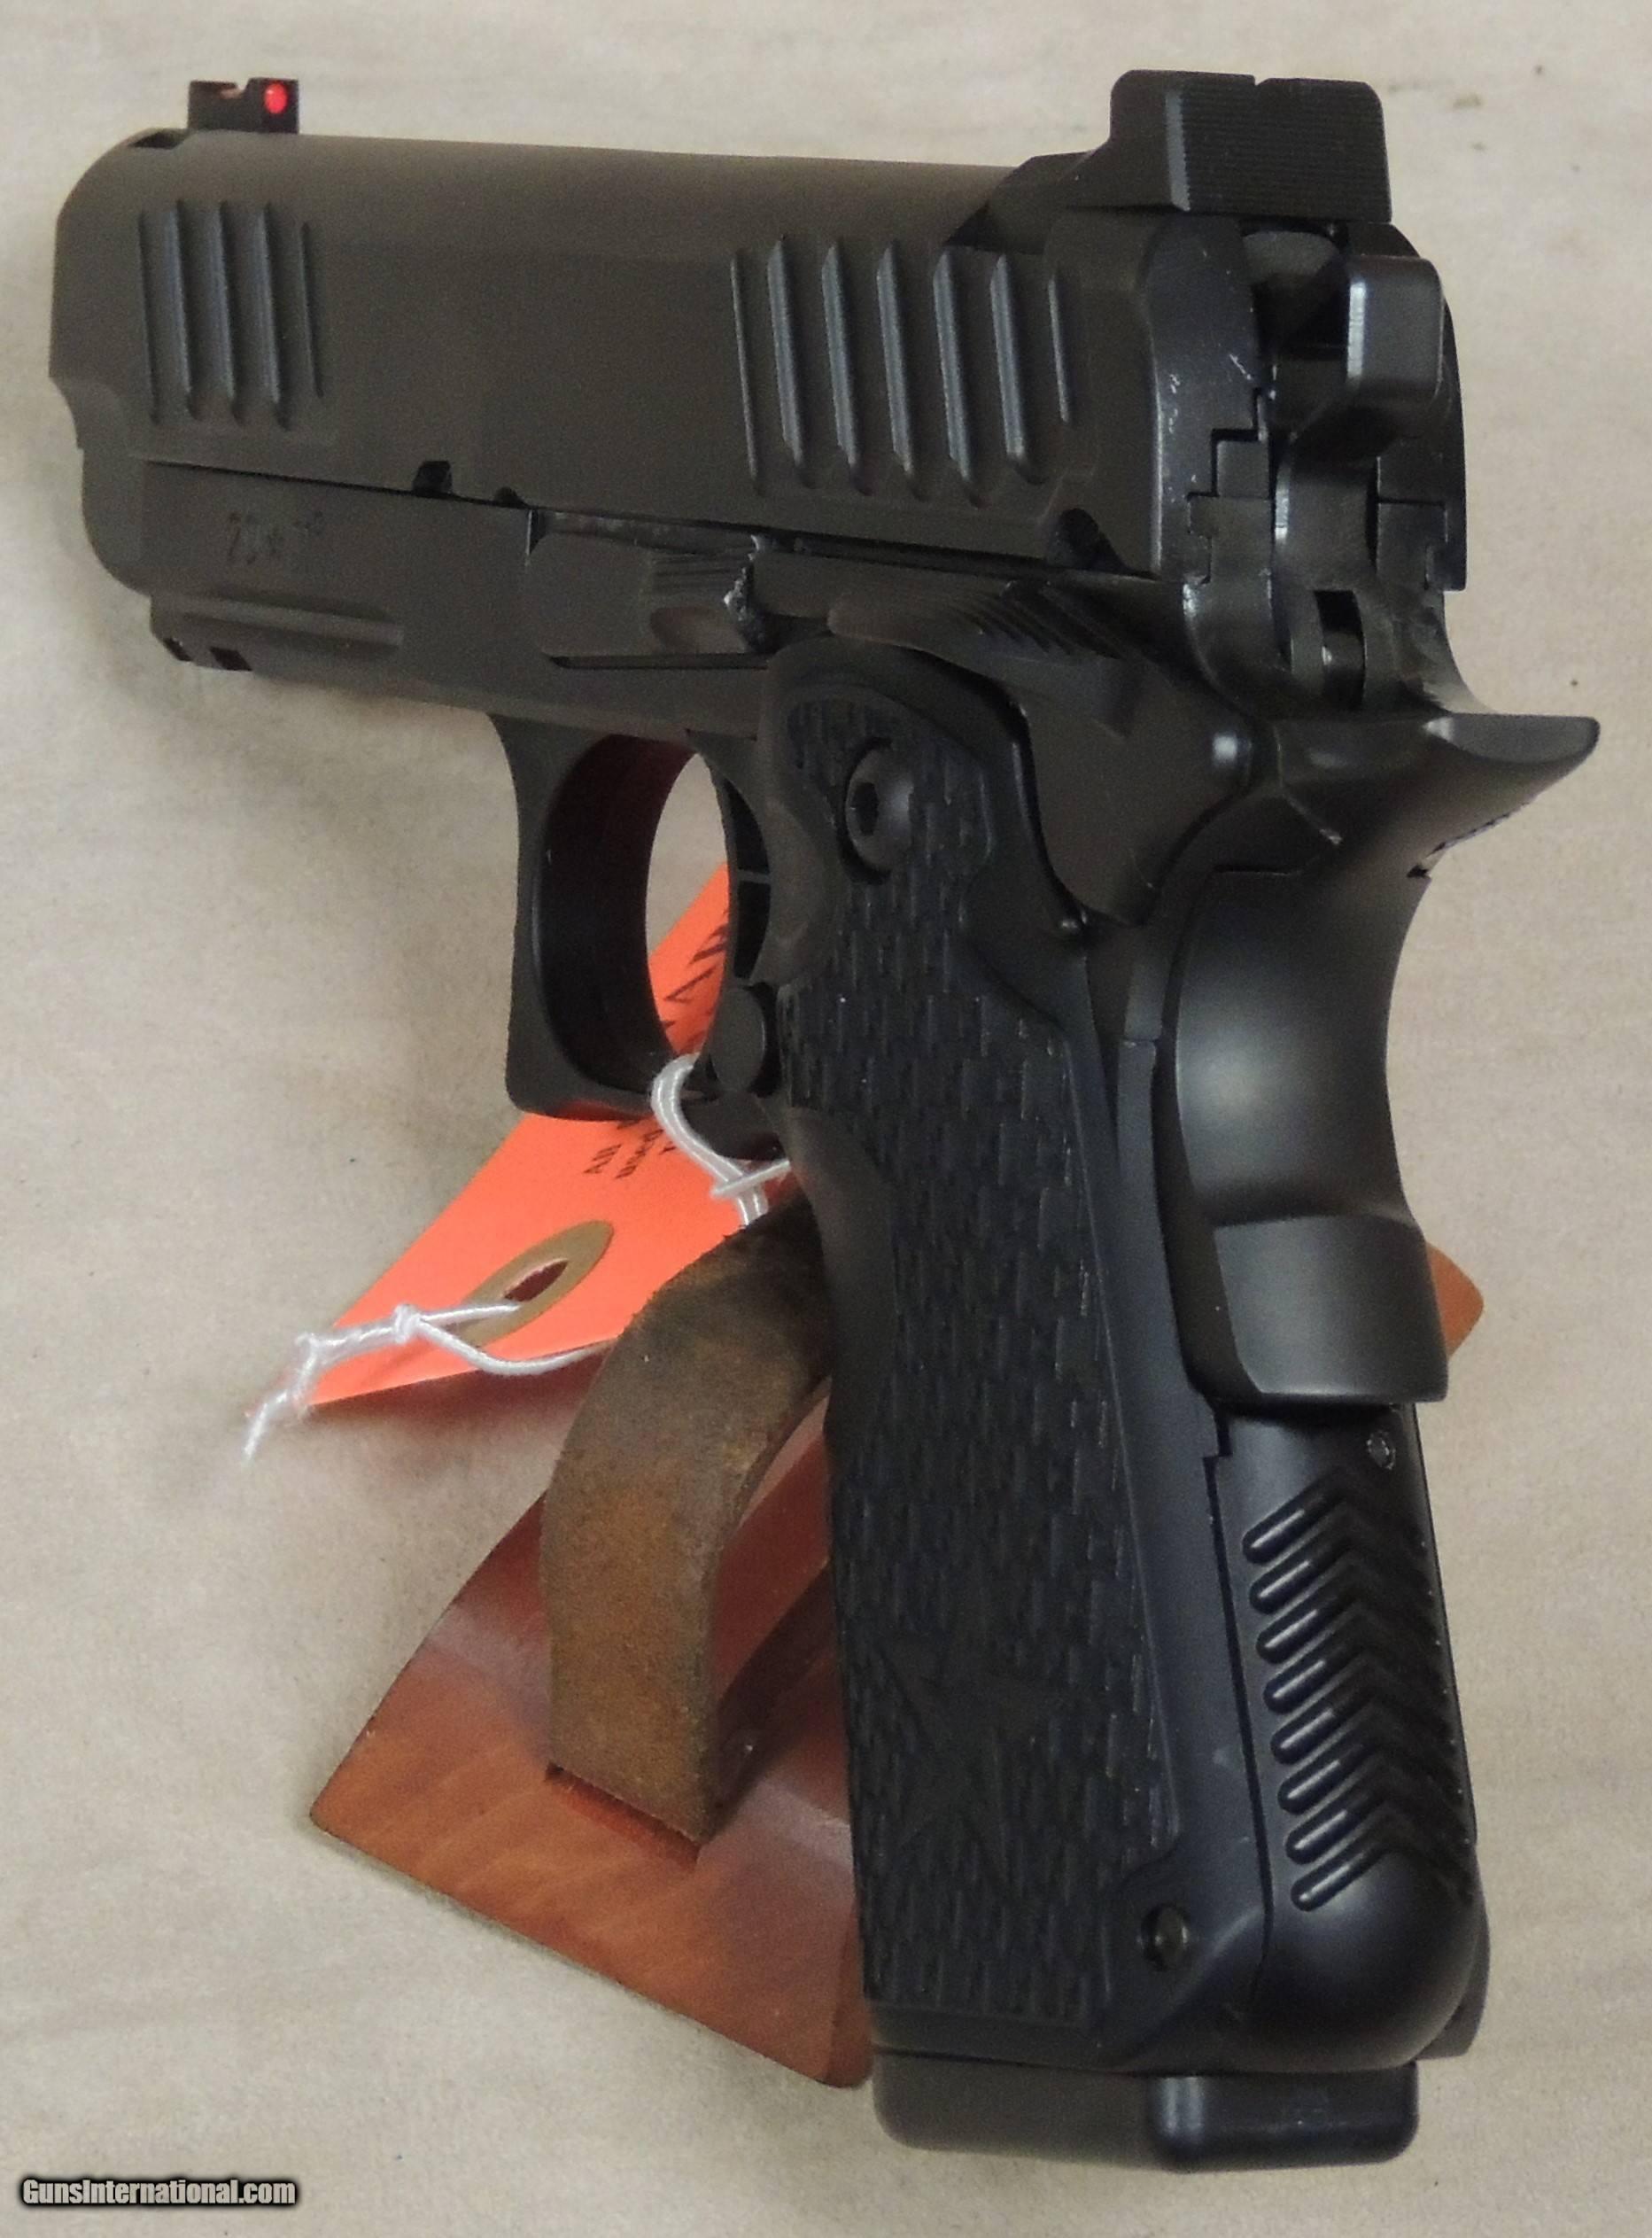 Sti For Sale >> STI Staccato-C 9mm Caliber CCW 2011 Pistol NIB S/N EH1318XX